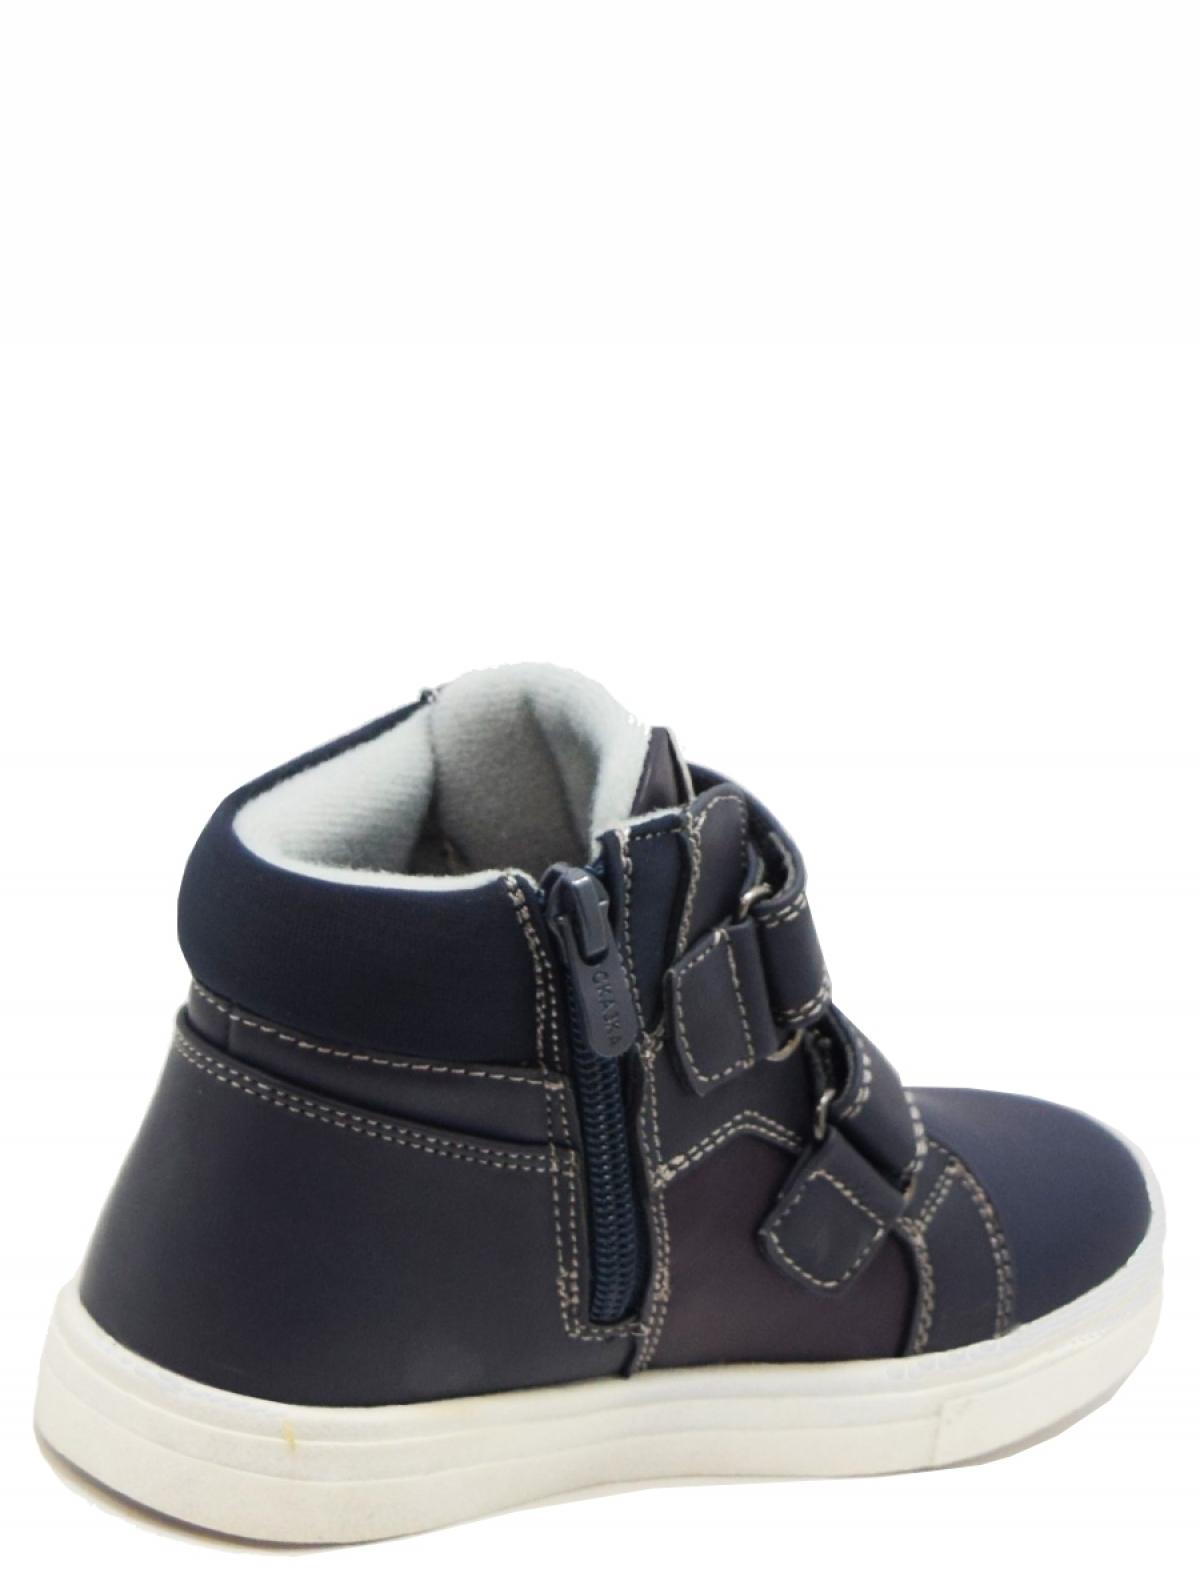 R253026731 ботинки для мальчика